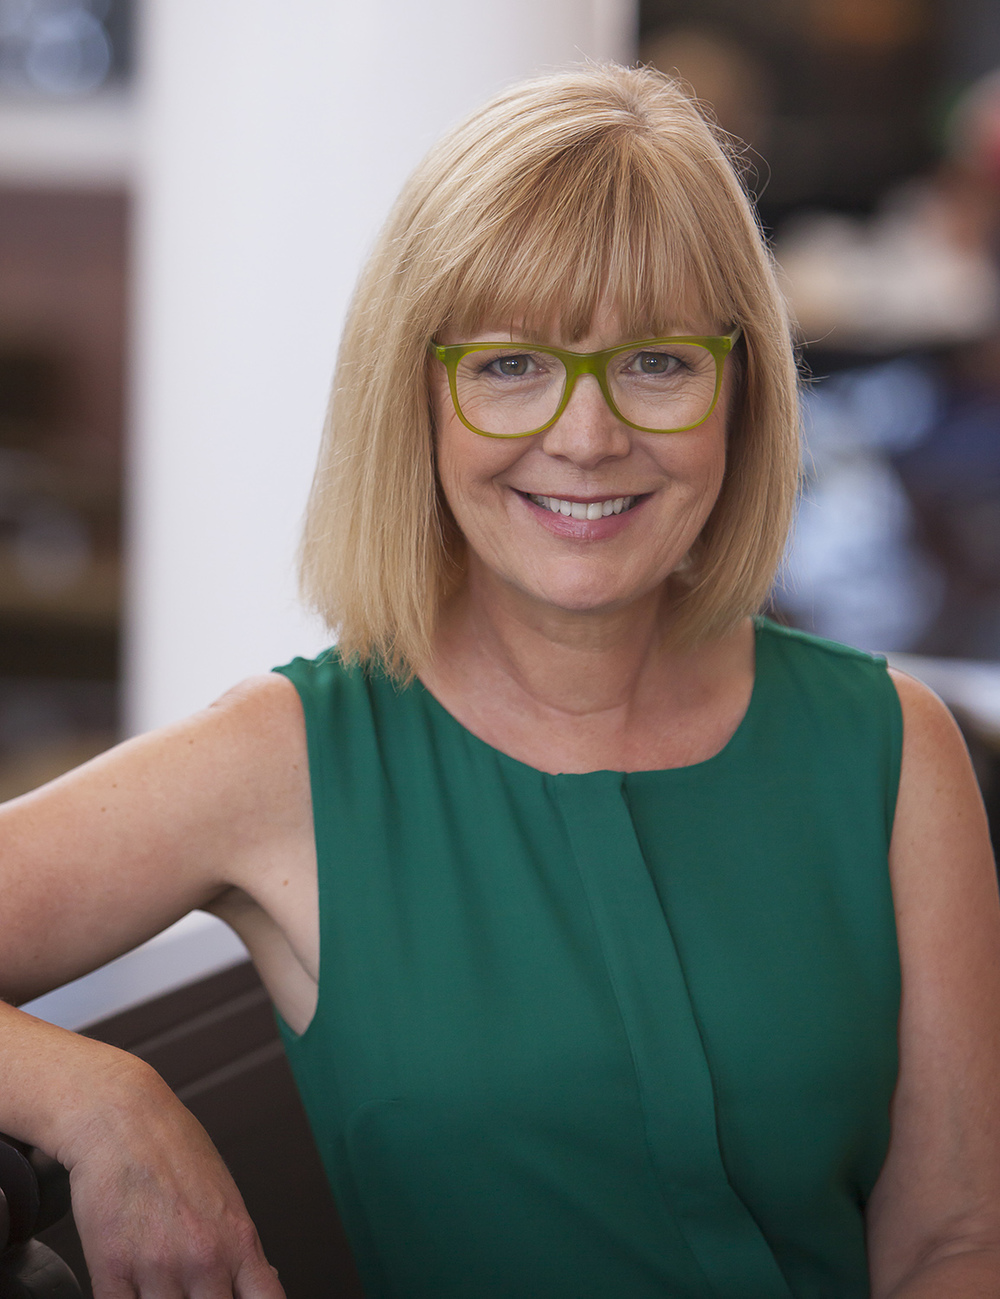 Contemporary Personal Branding Portraits by Denver Photographer Jennifer Koskinen | Merritt Portrait Studio